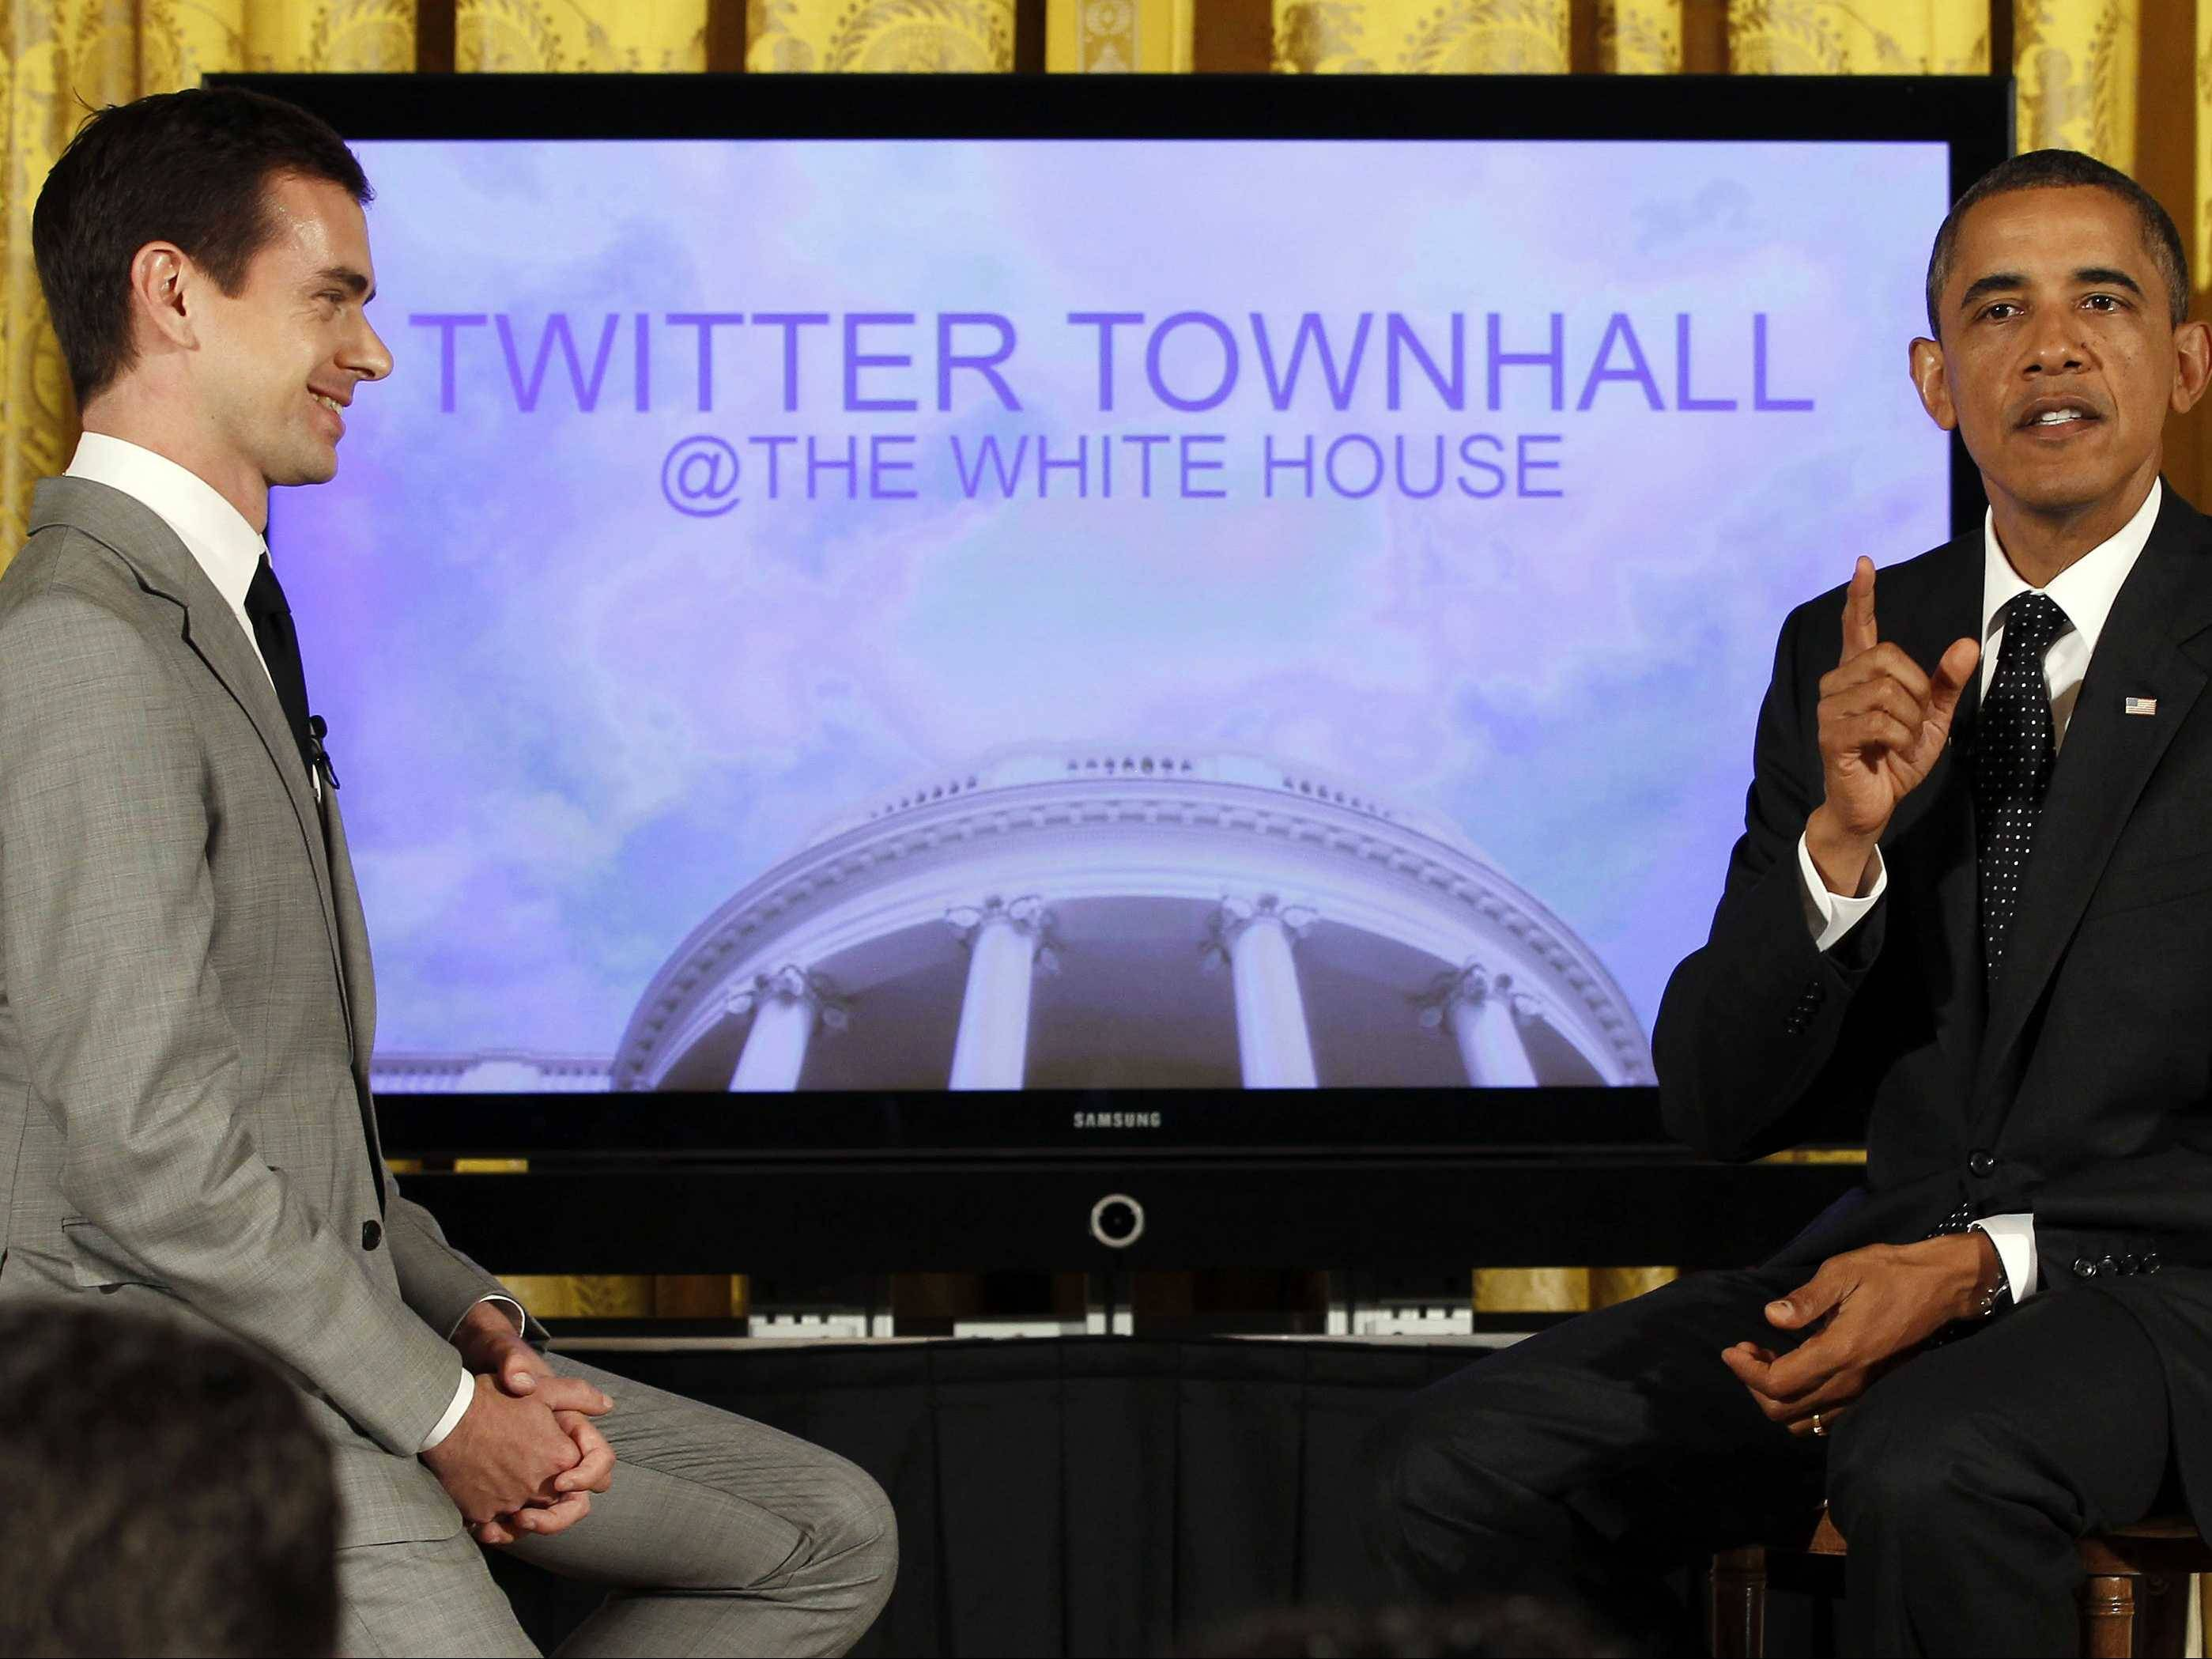 Dorsey interviews barack obama